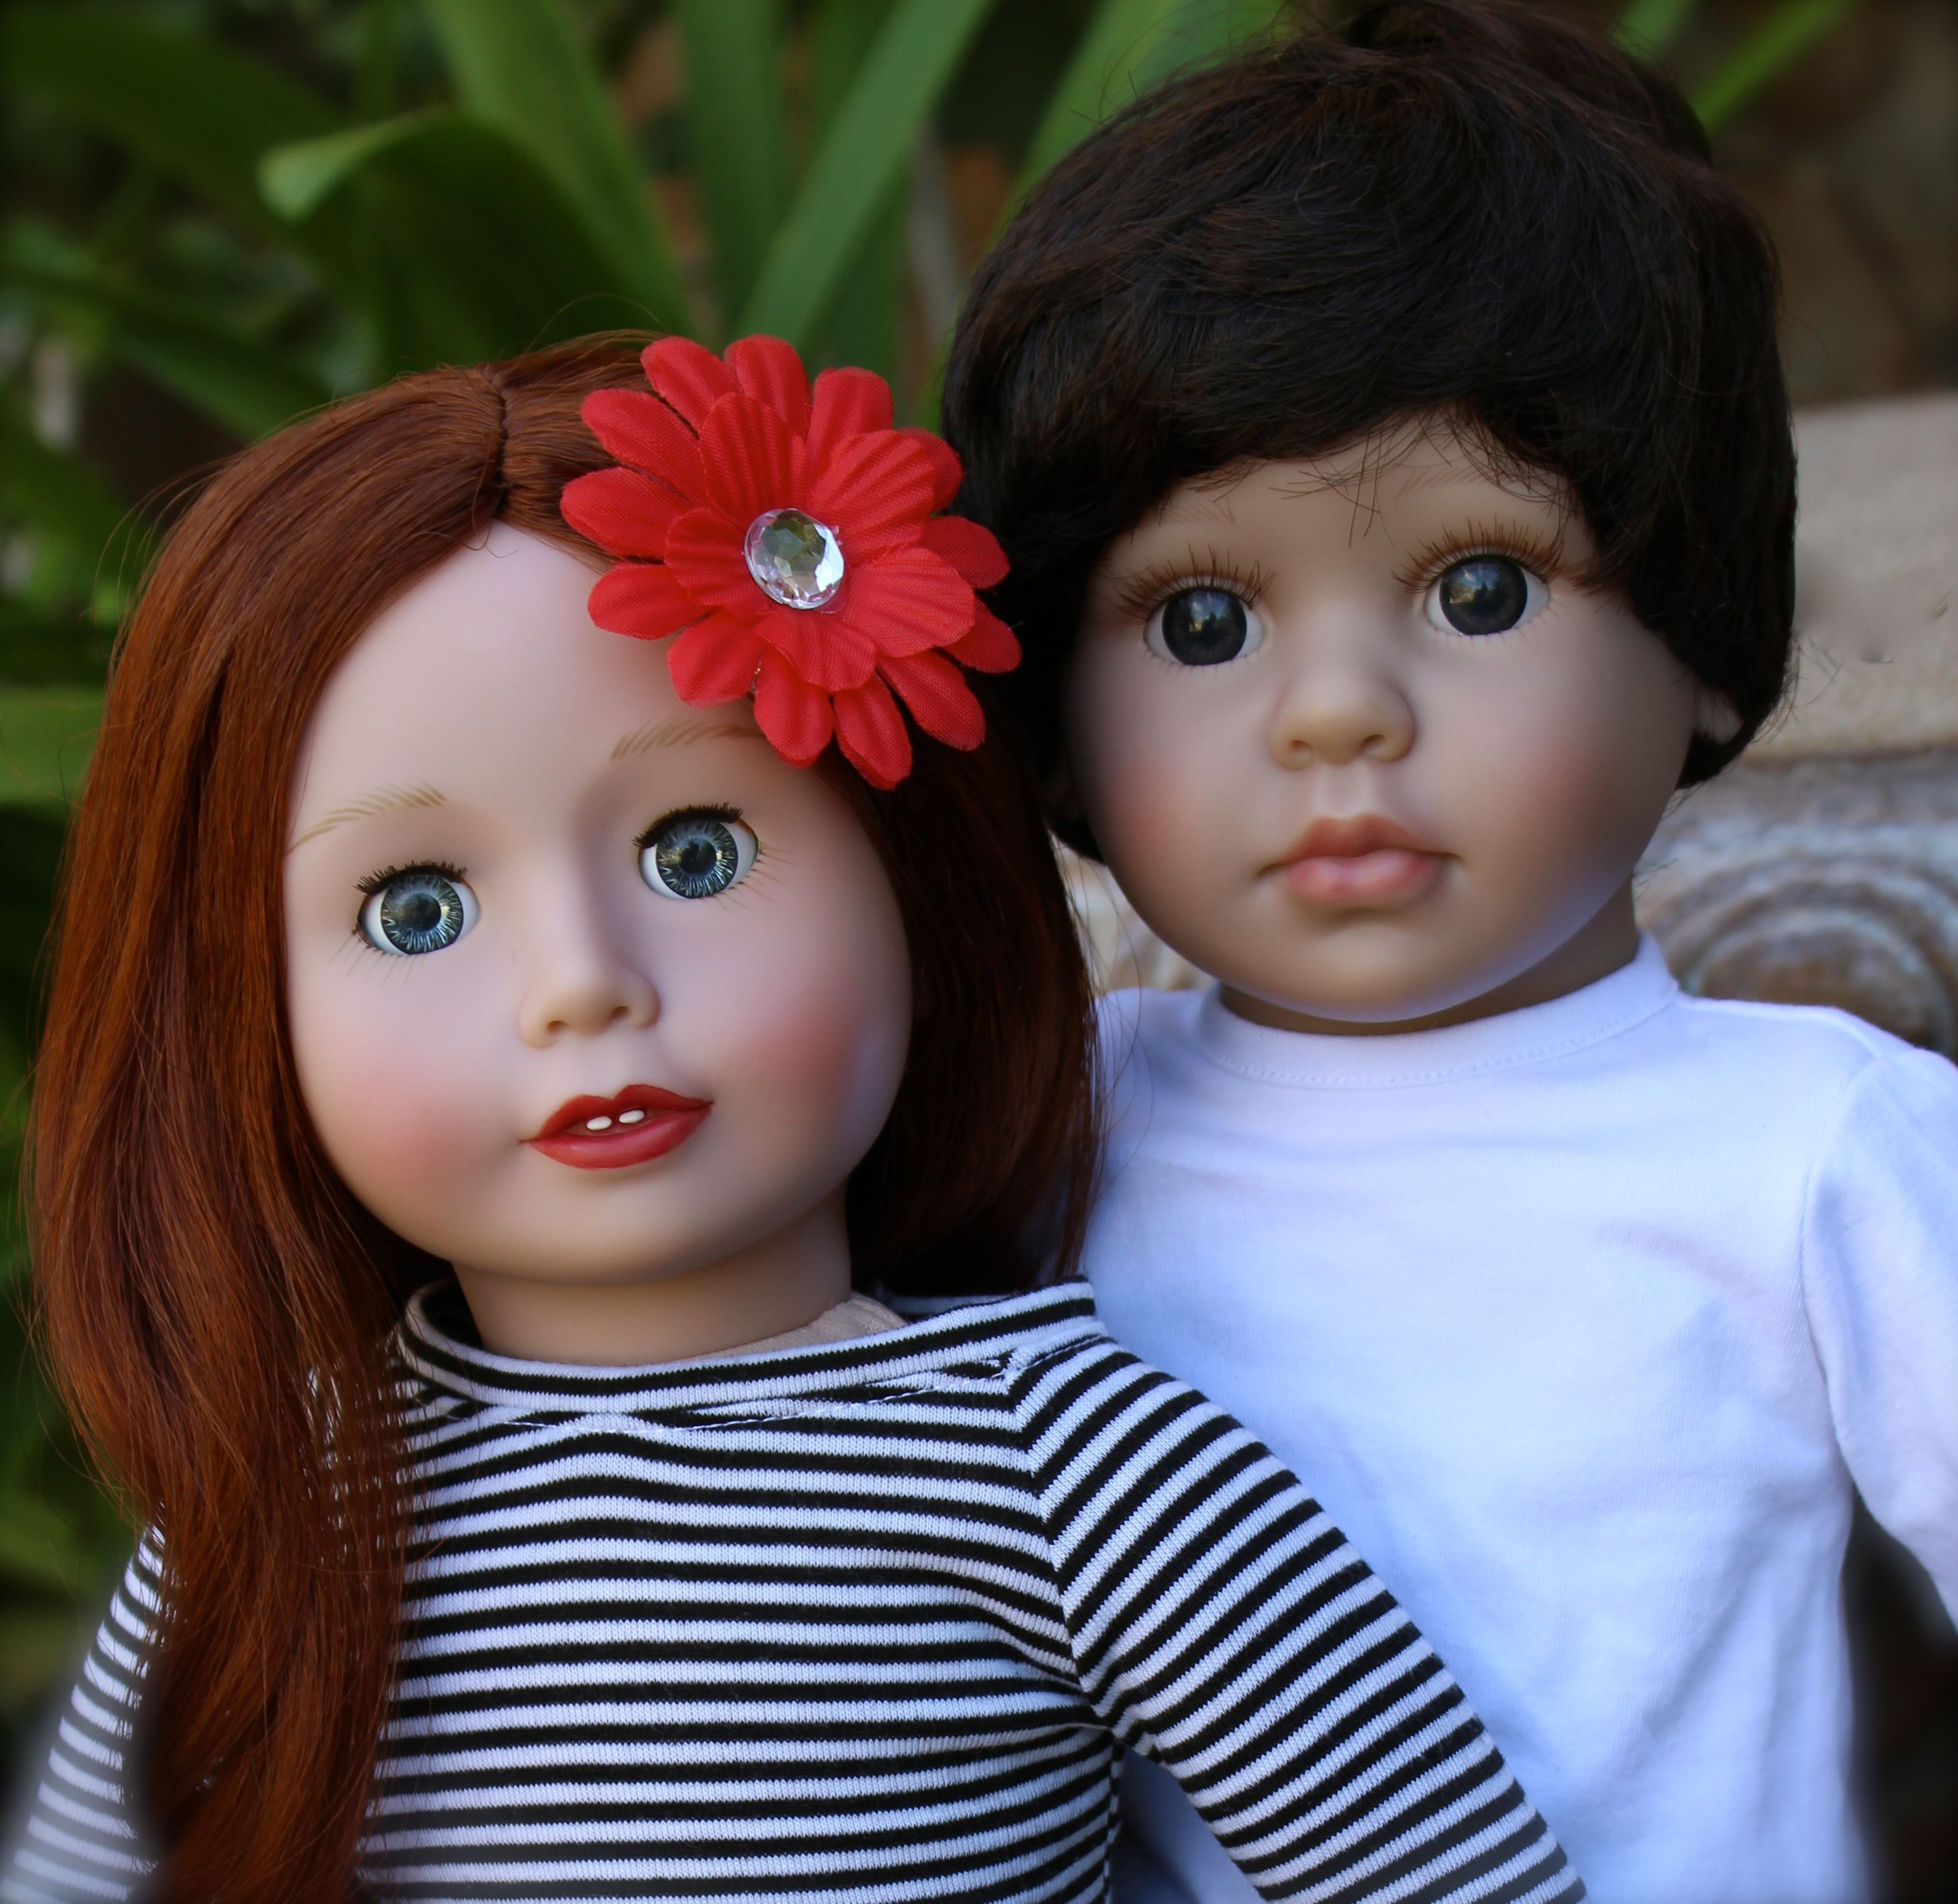 The best 18 inch Doll Video Ever. Harmony Club Dolls. https://www.youtube.com/watch?v=EfPjSajCR-8